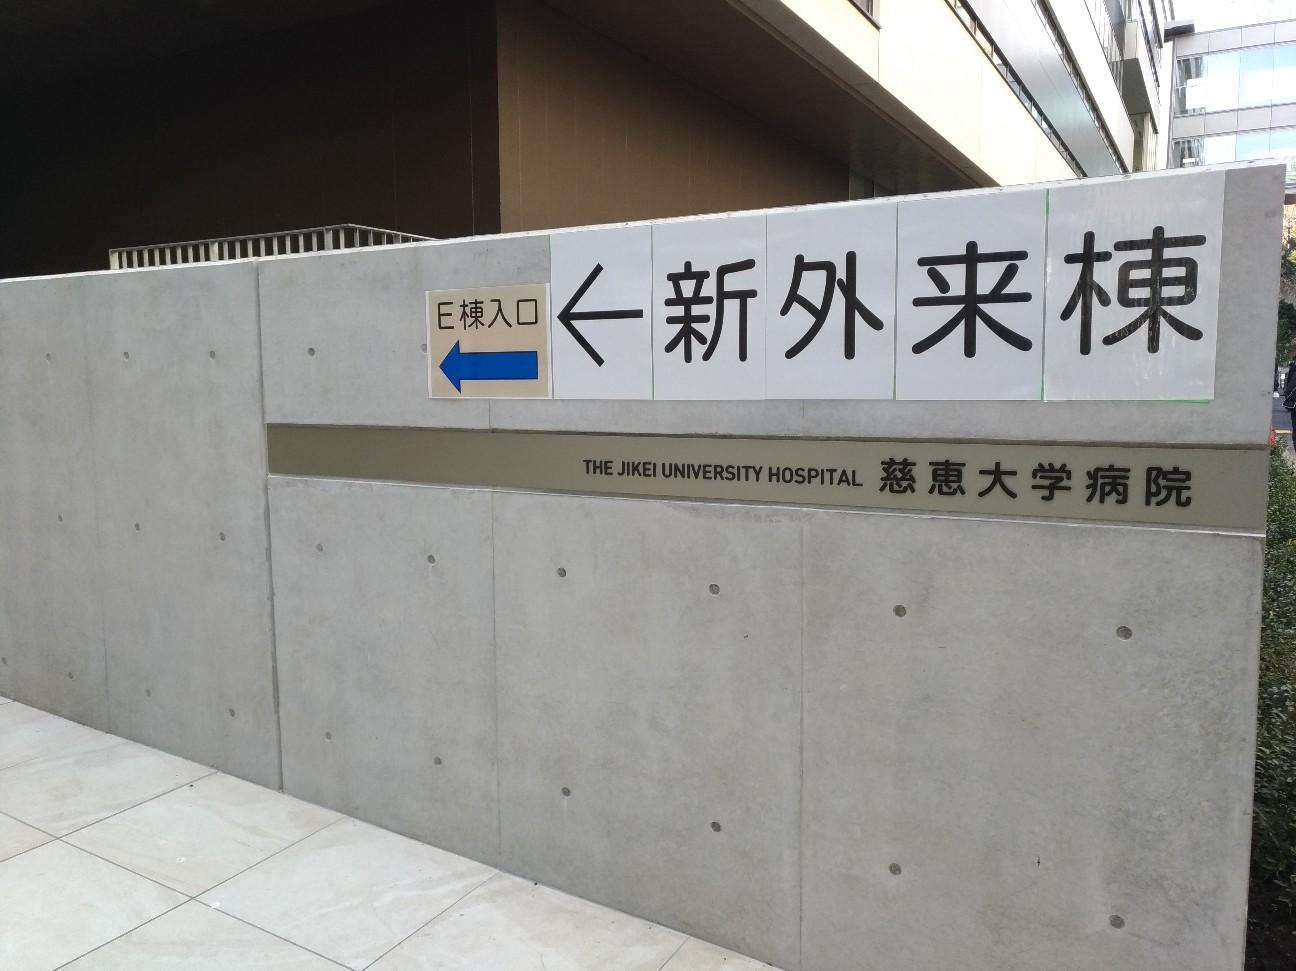 f:id:HKT1989:20200117222942j:image